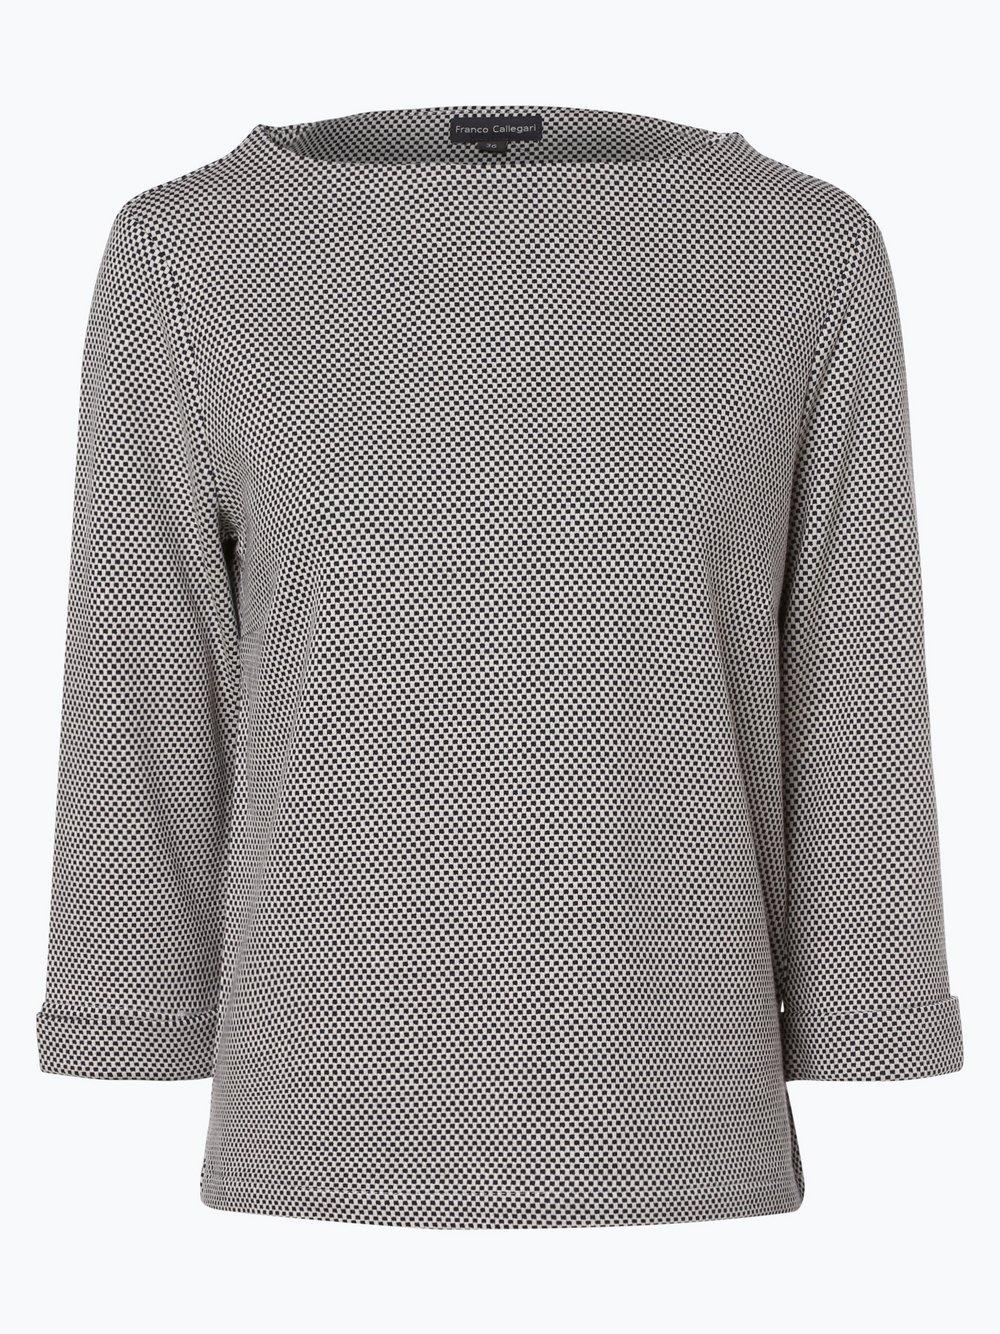 Franco Callegari – Damska bluza nierozpinana, niebieski Van Graaf 421132-0005